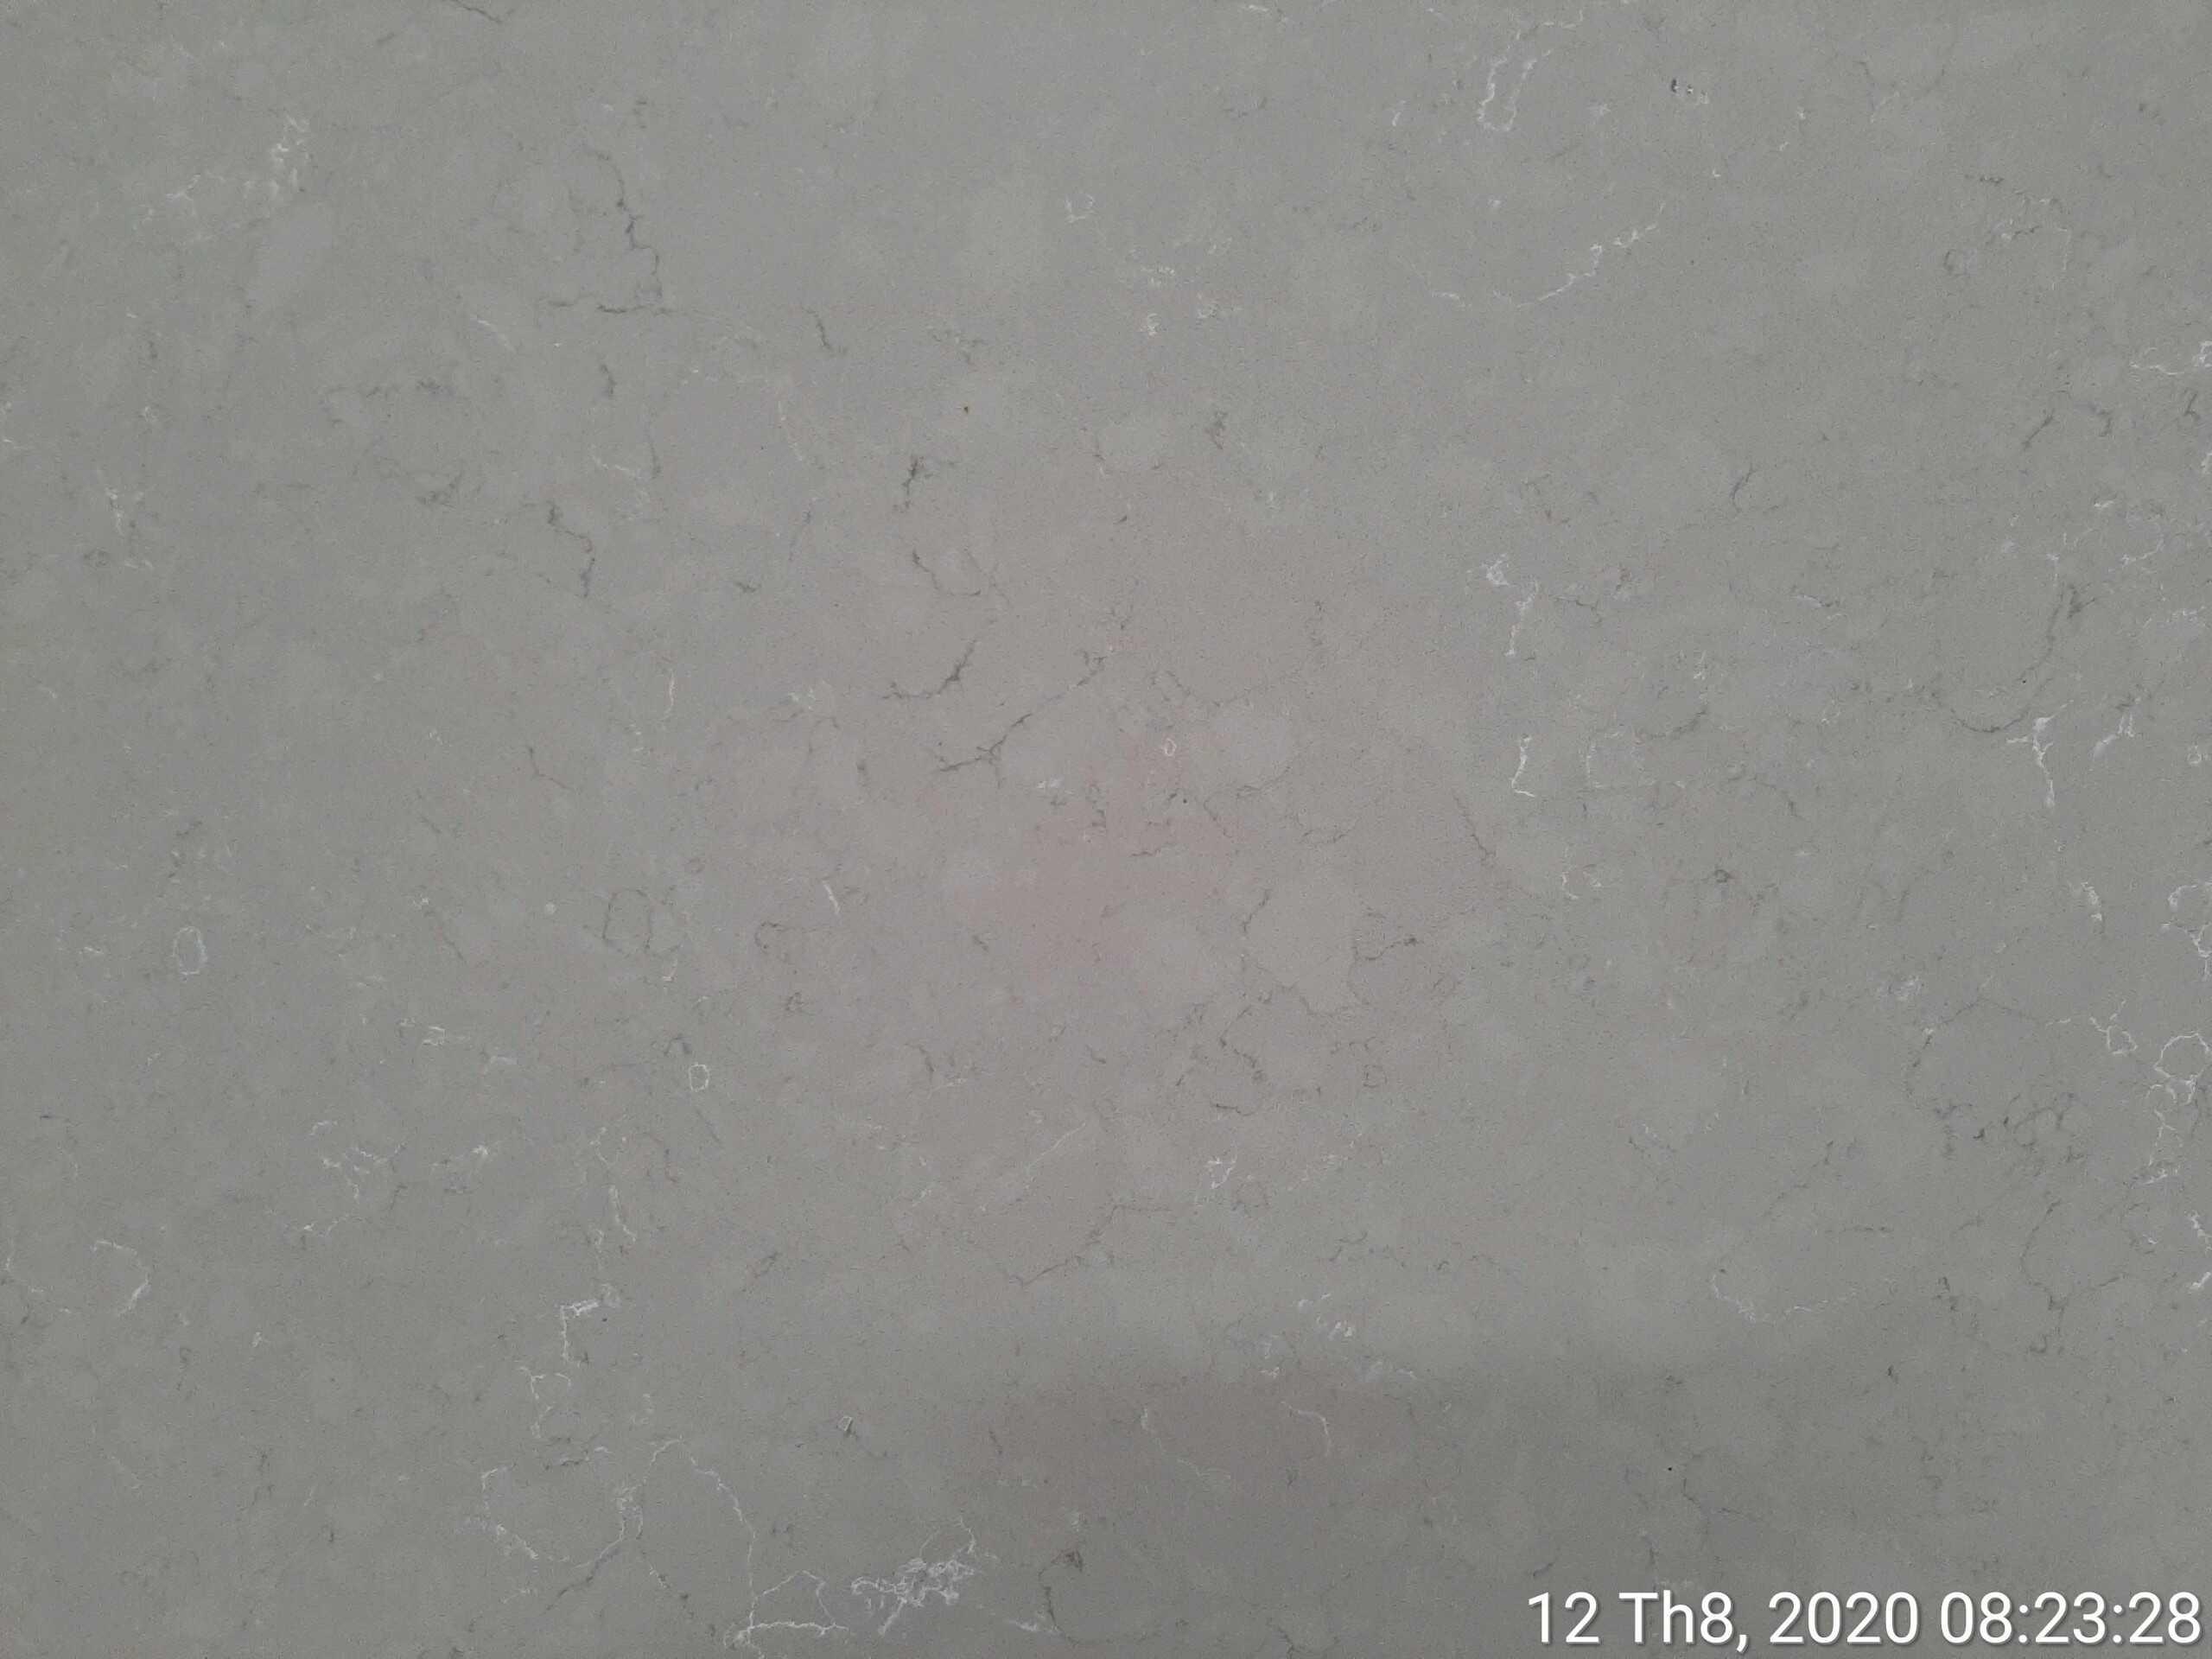 Surfaces Engineered Quartz from Vietnam